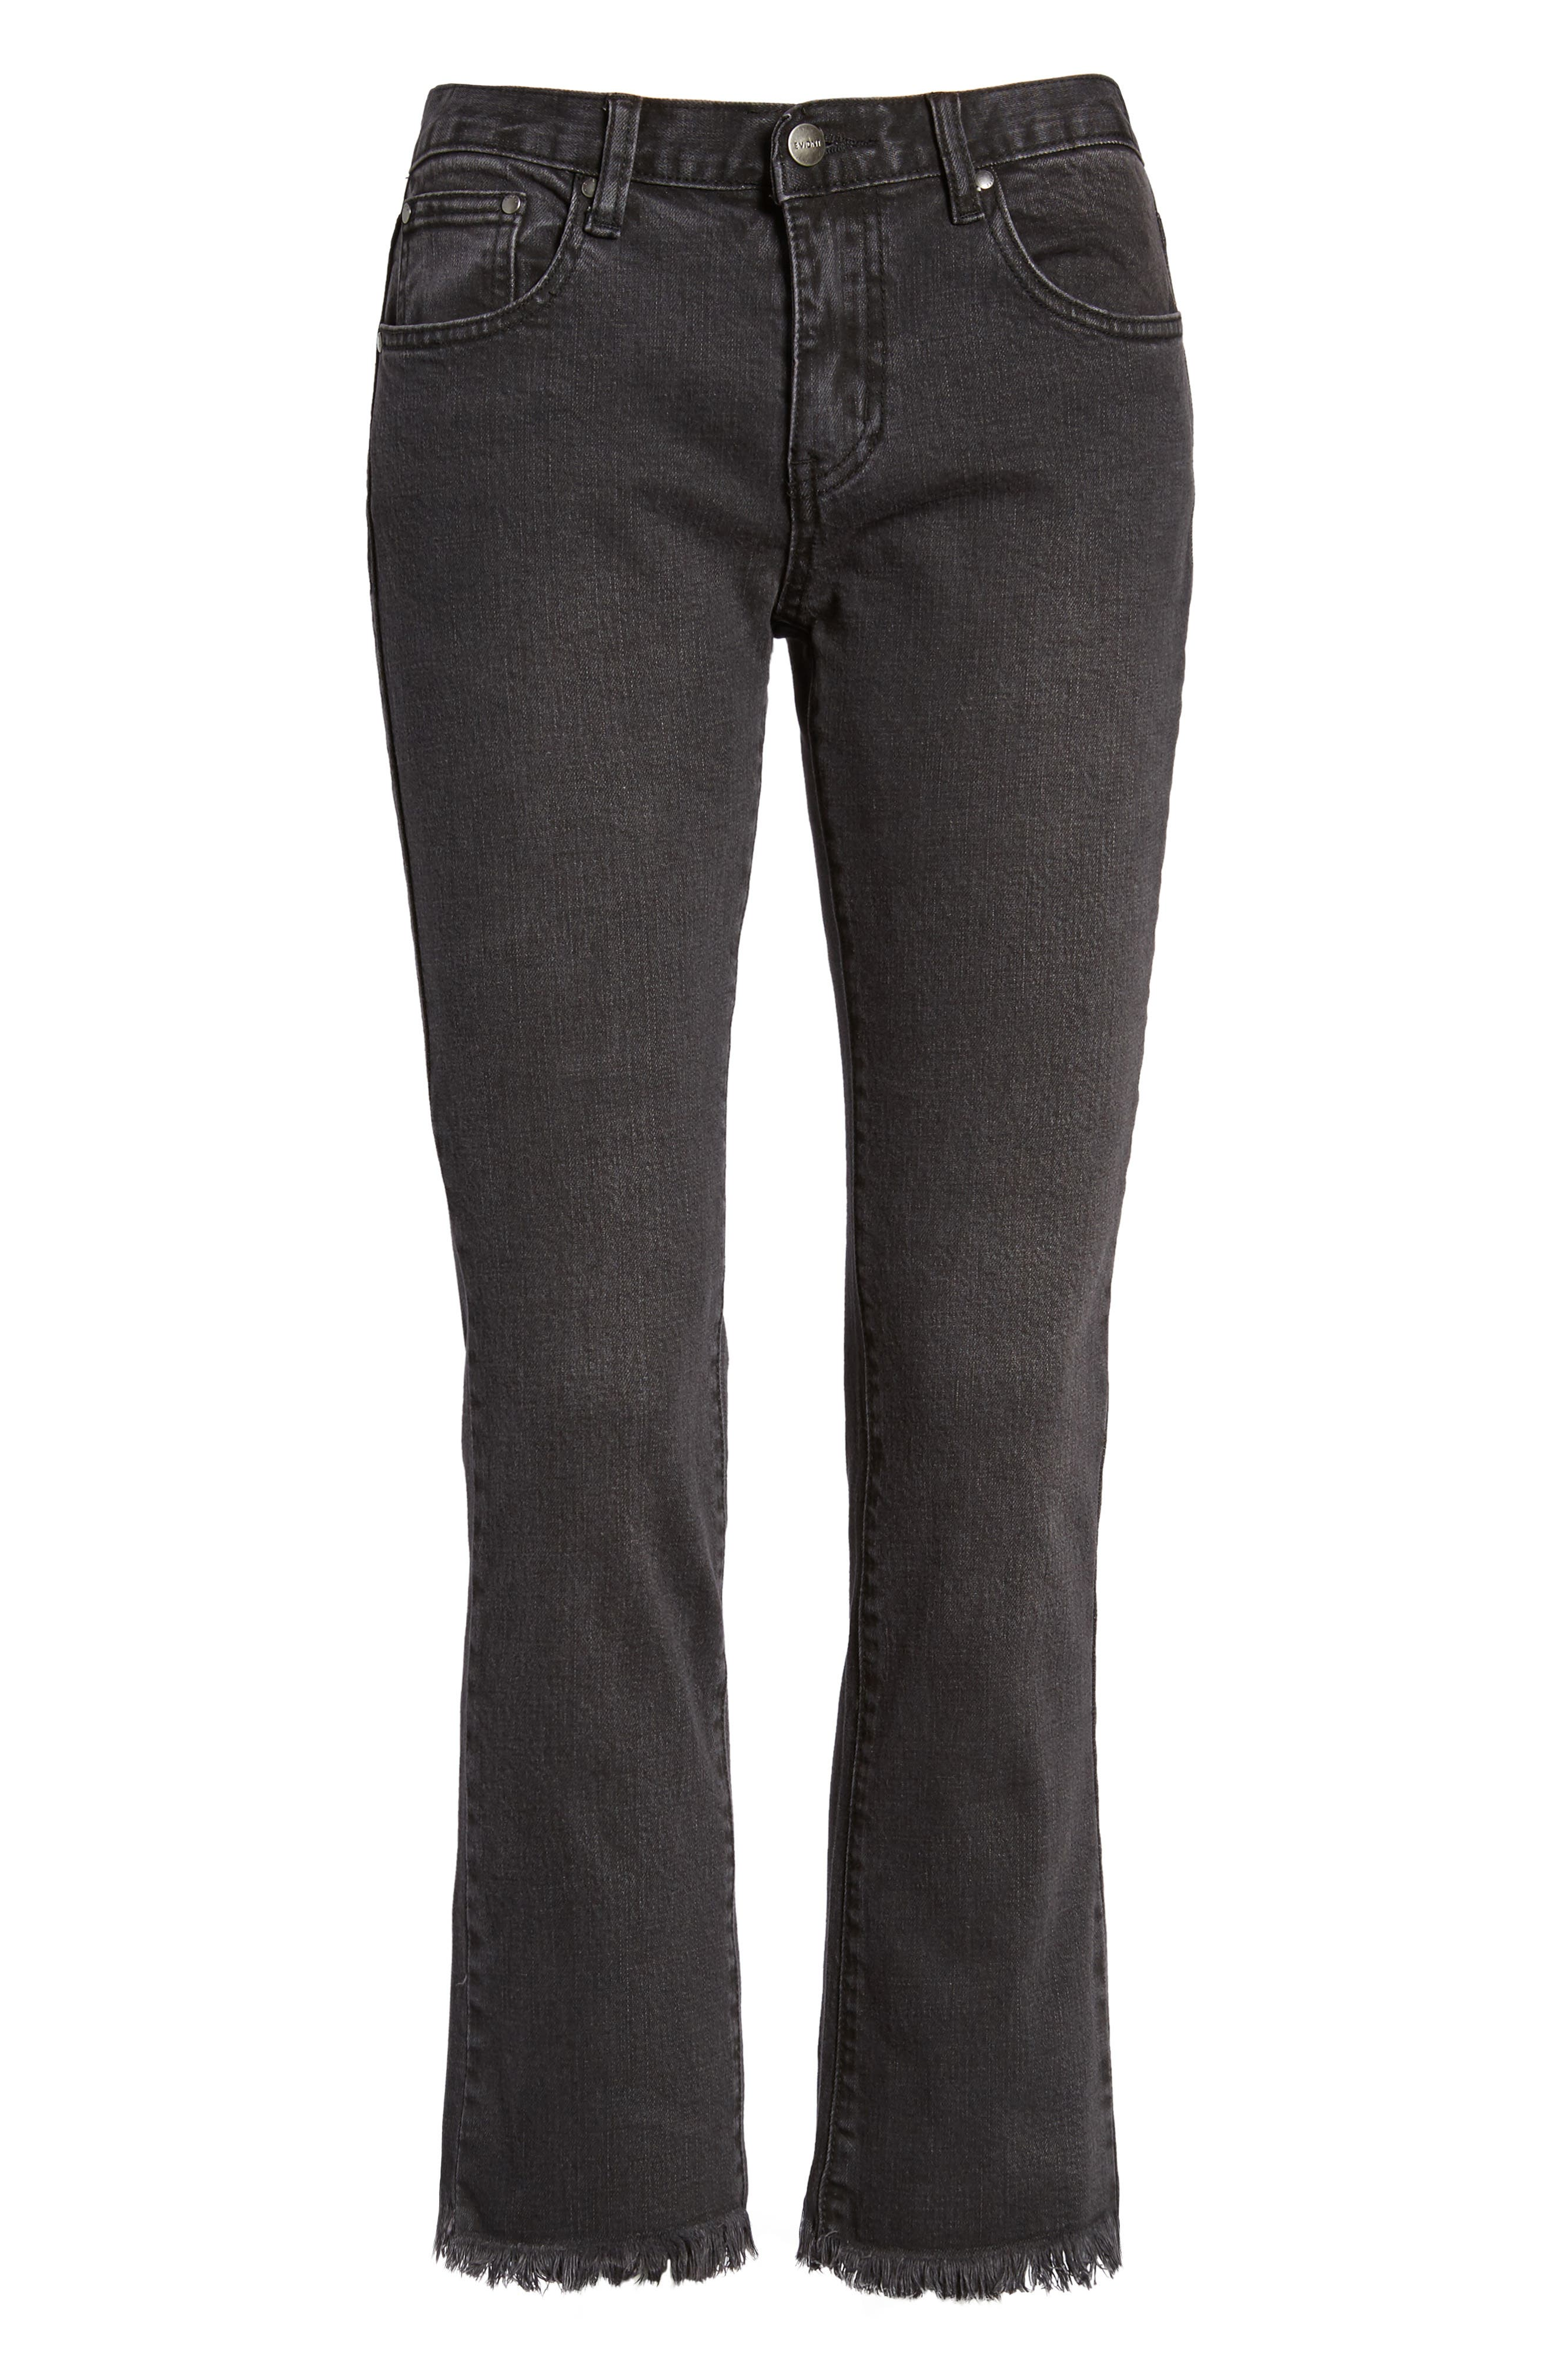 Hermosa Fray Hem Ankle Skinny Jeans,                             Alternate thumbnail 6, color,                             001